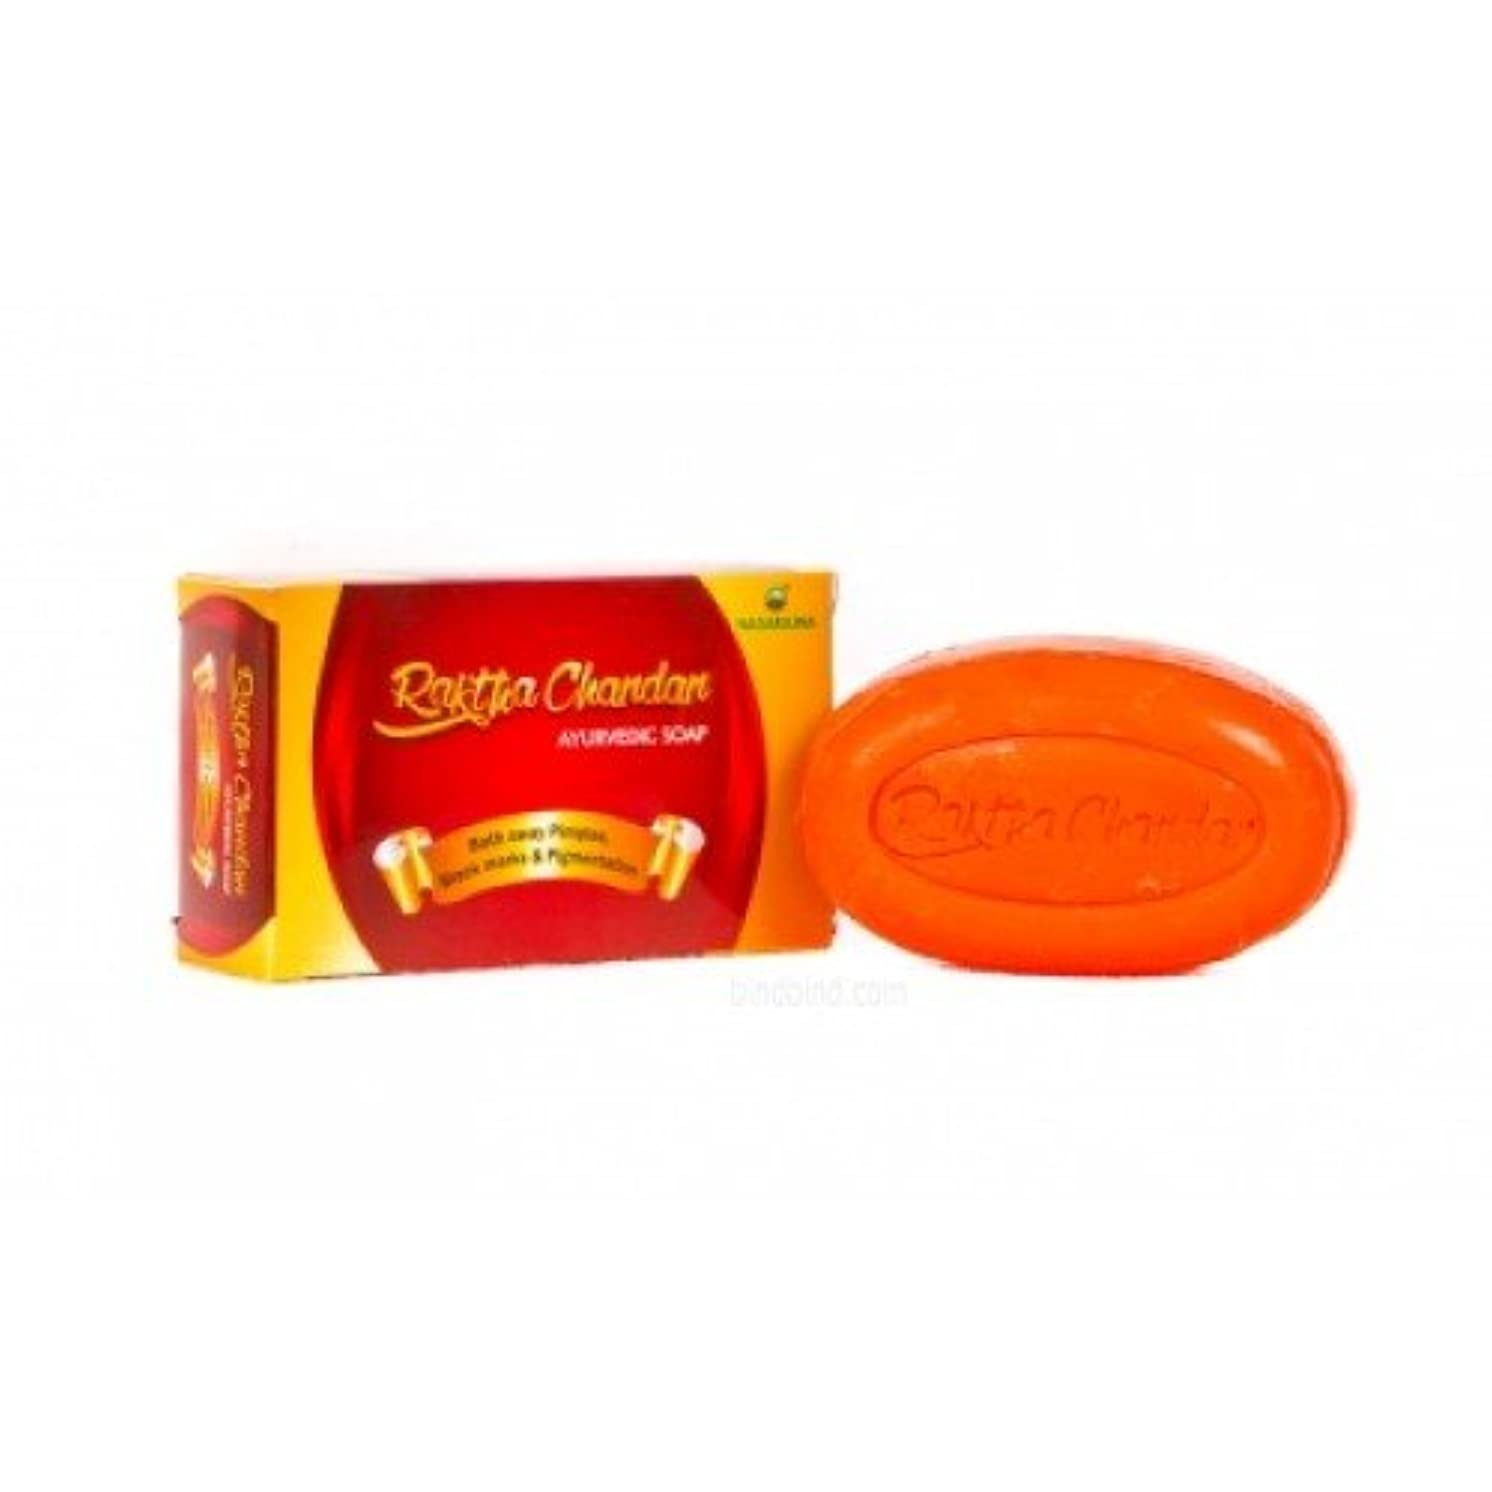 Nagarjuna Raktha Chandan Ayurvedic Soap Best For Glowing Skin